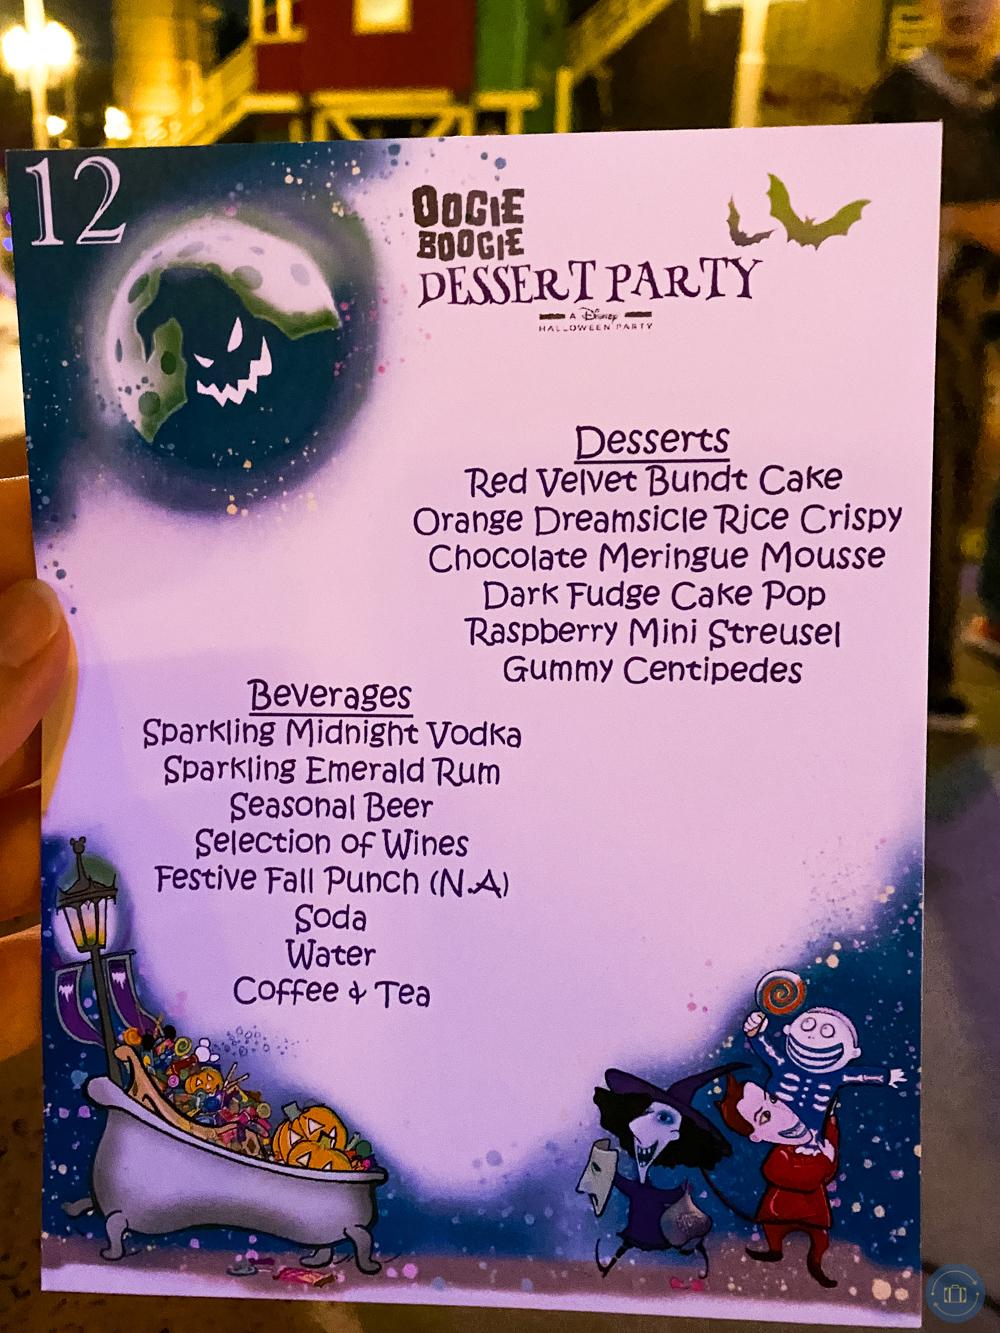 oogie boogie bash sonoma terrace dessert dining package menu